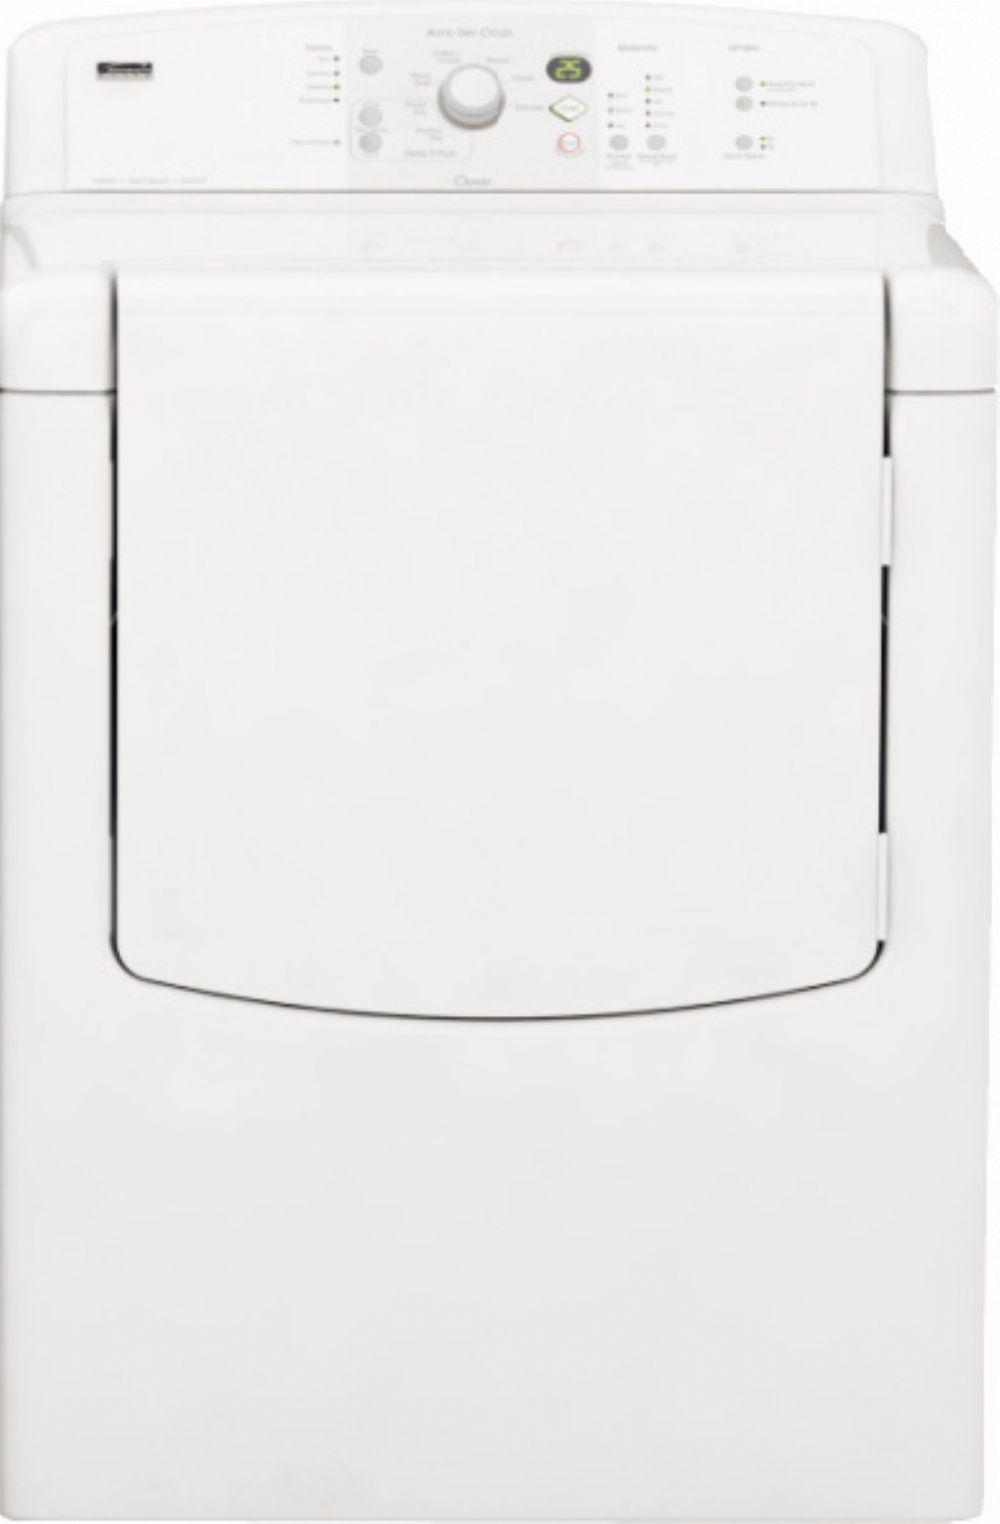 kenmore dryer electrical diagram blow drying kenmore elite dryer electrical circuit diagram for model 110